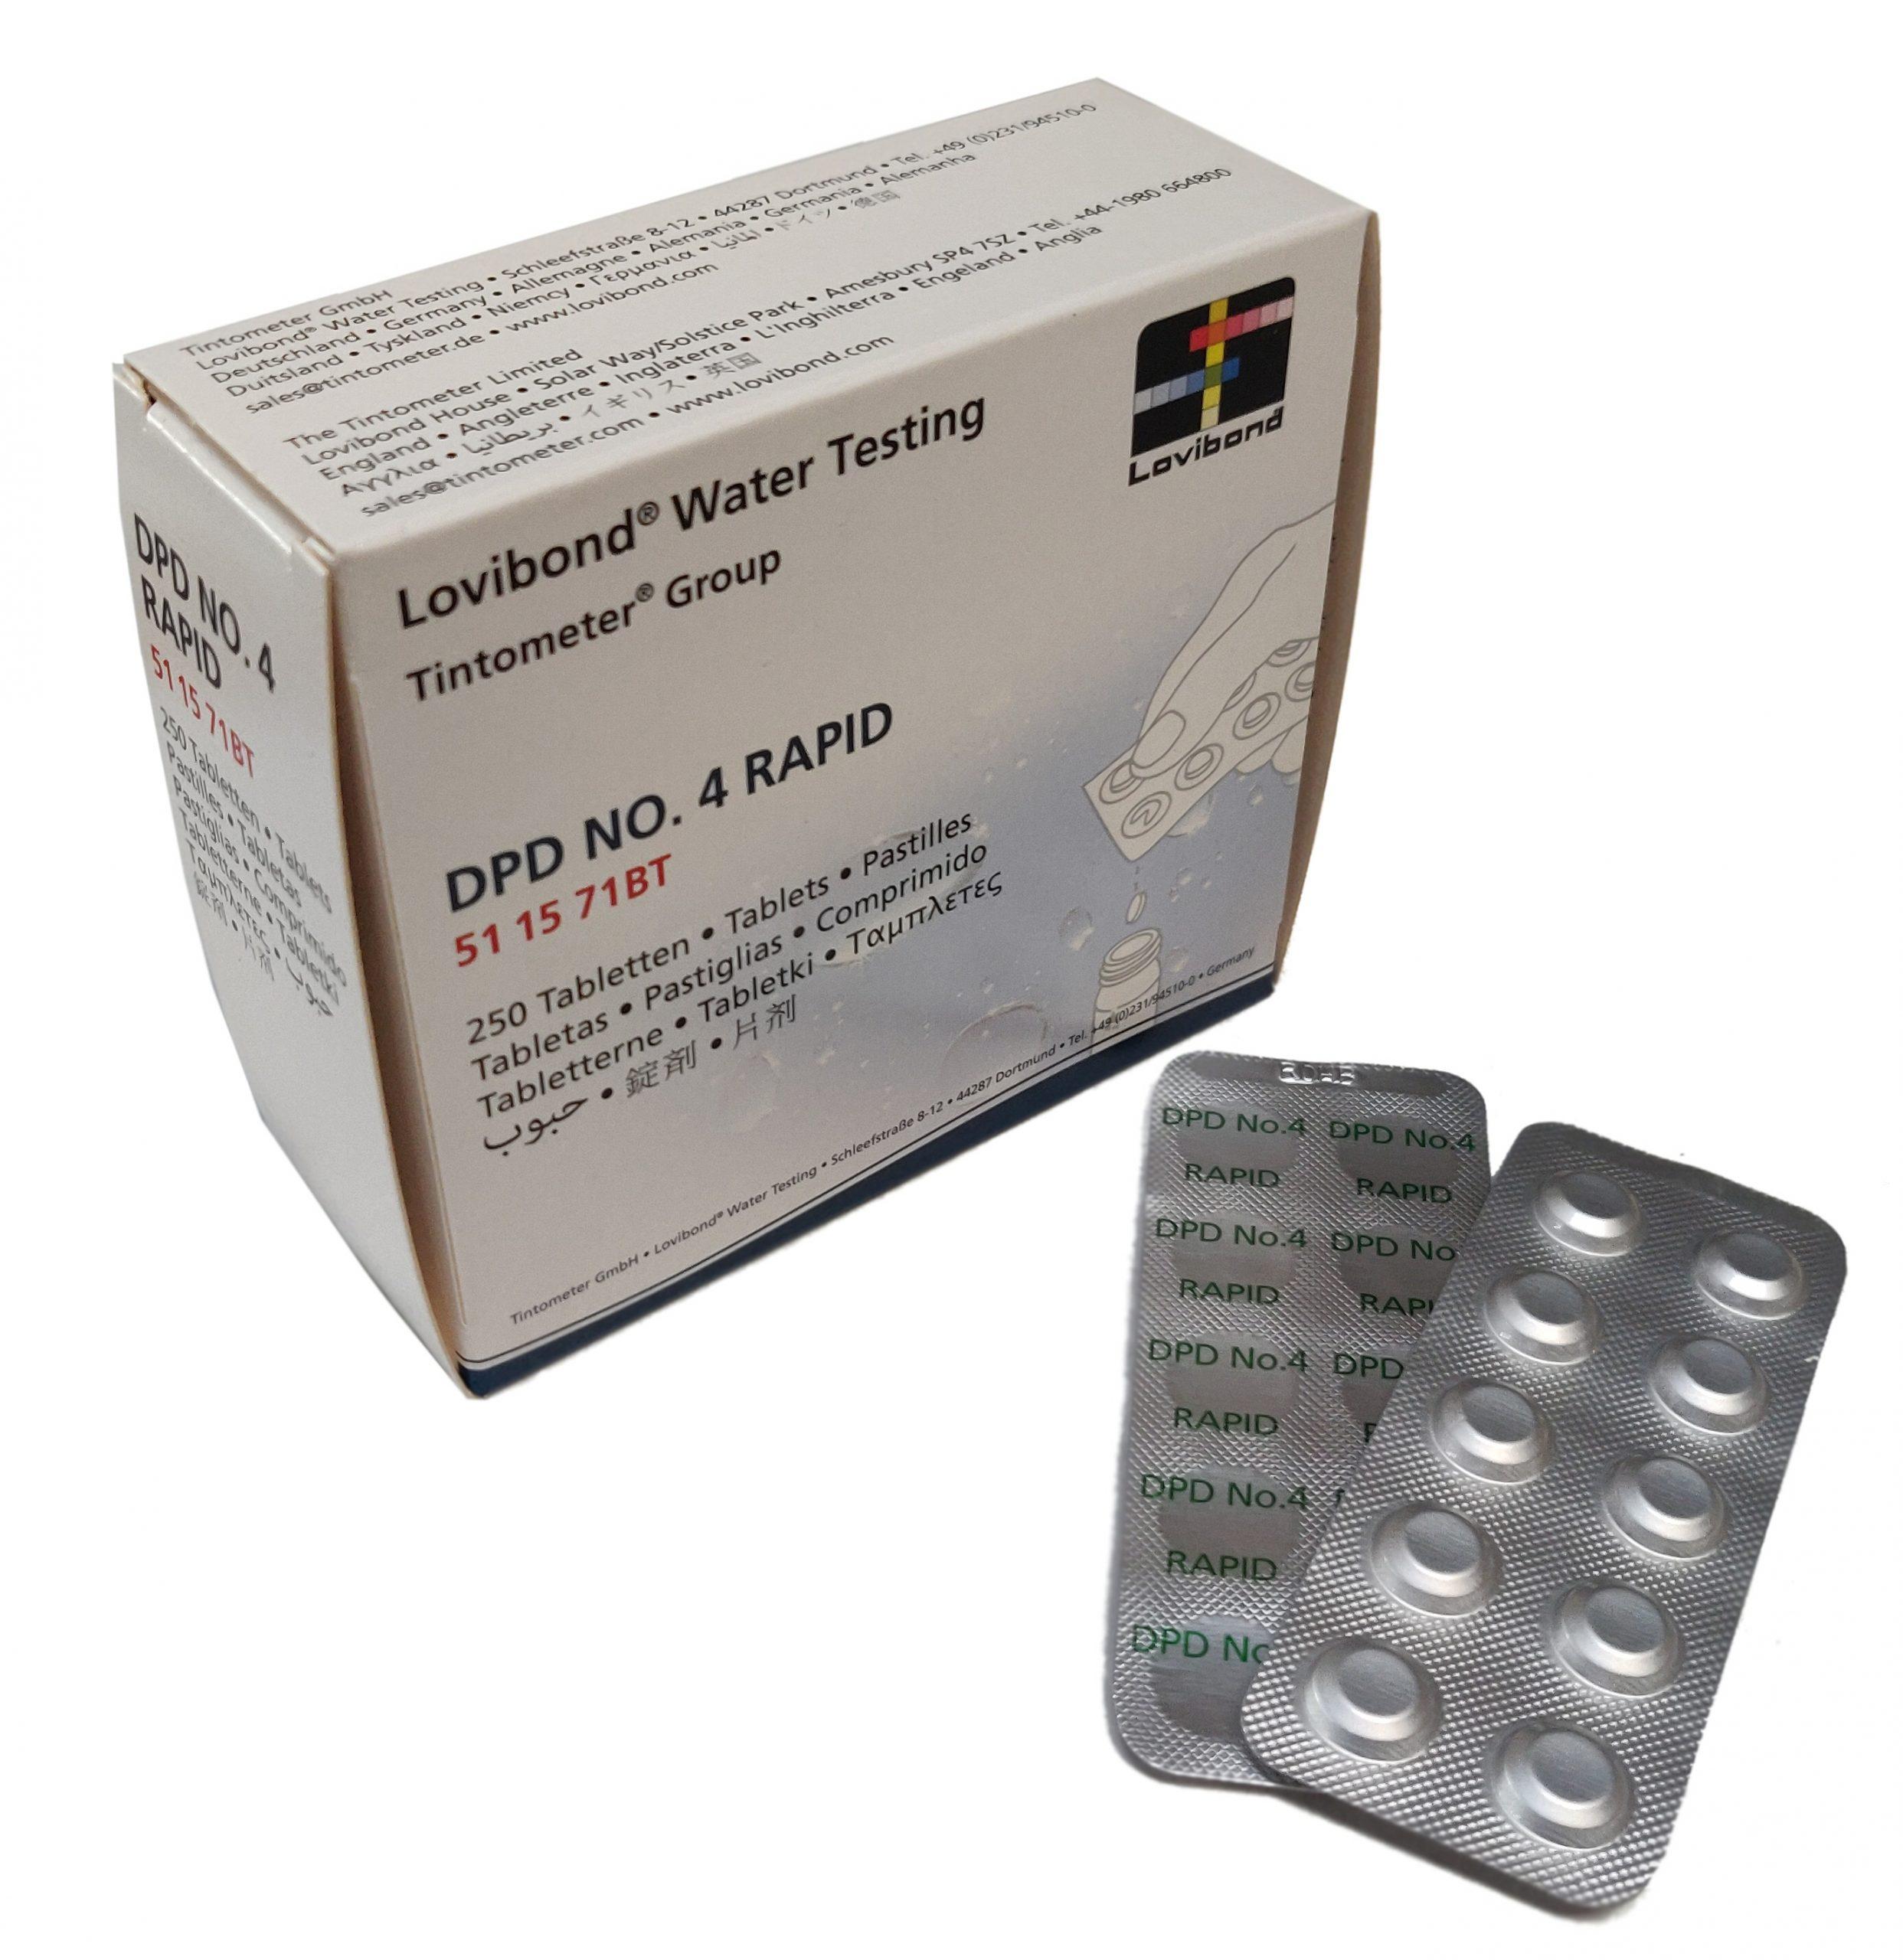 DPD nr. 4 Rapid, Aktiv Oxygen (håndryster)